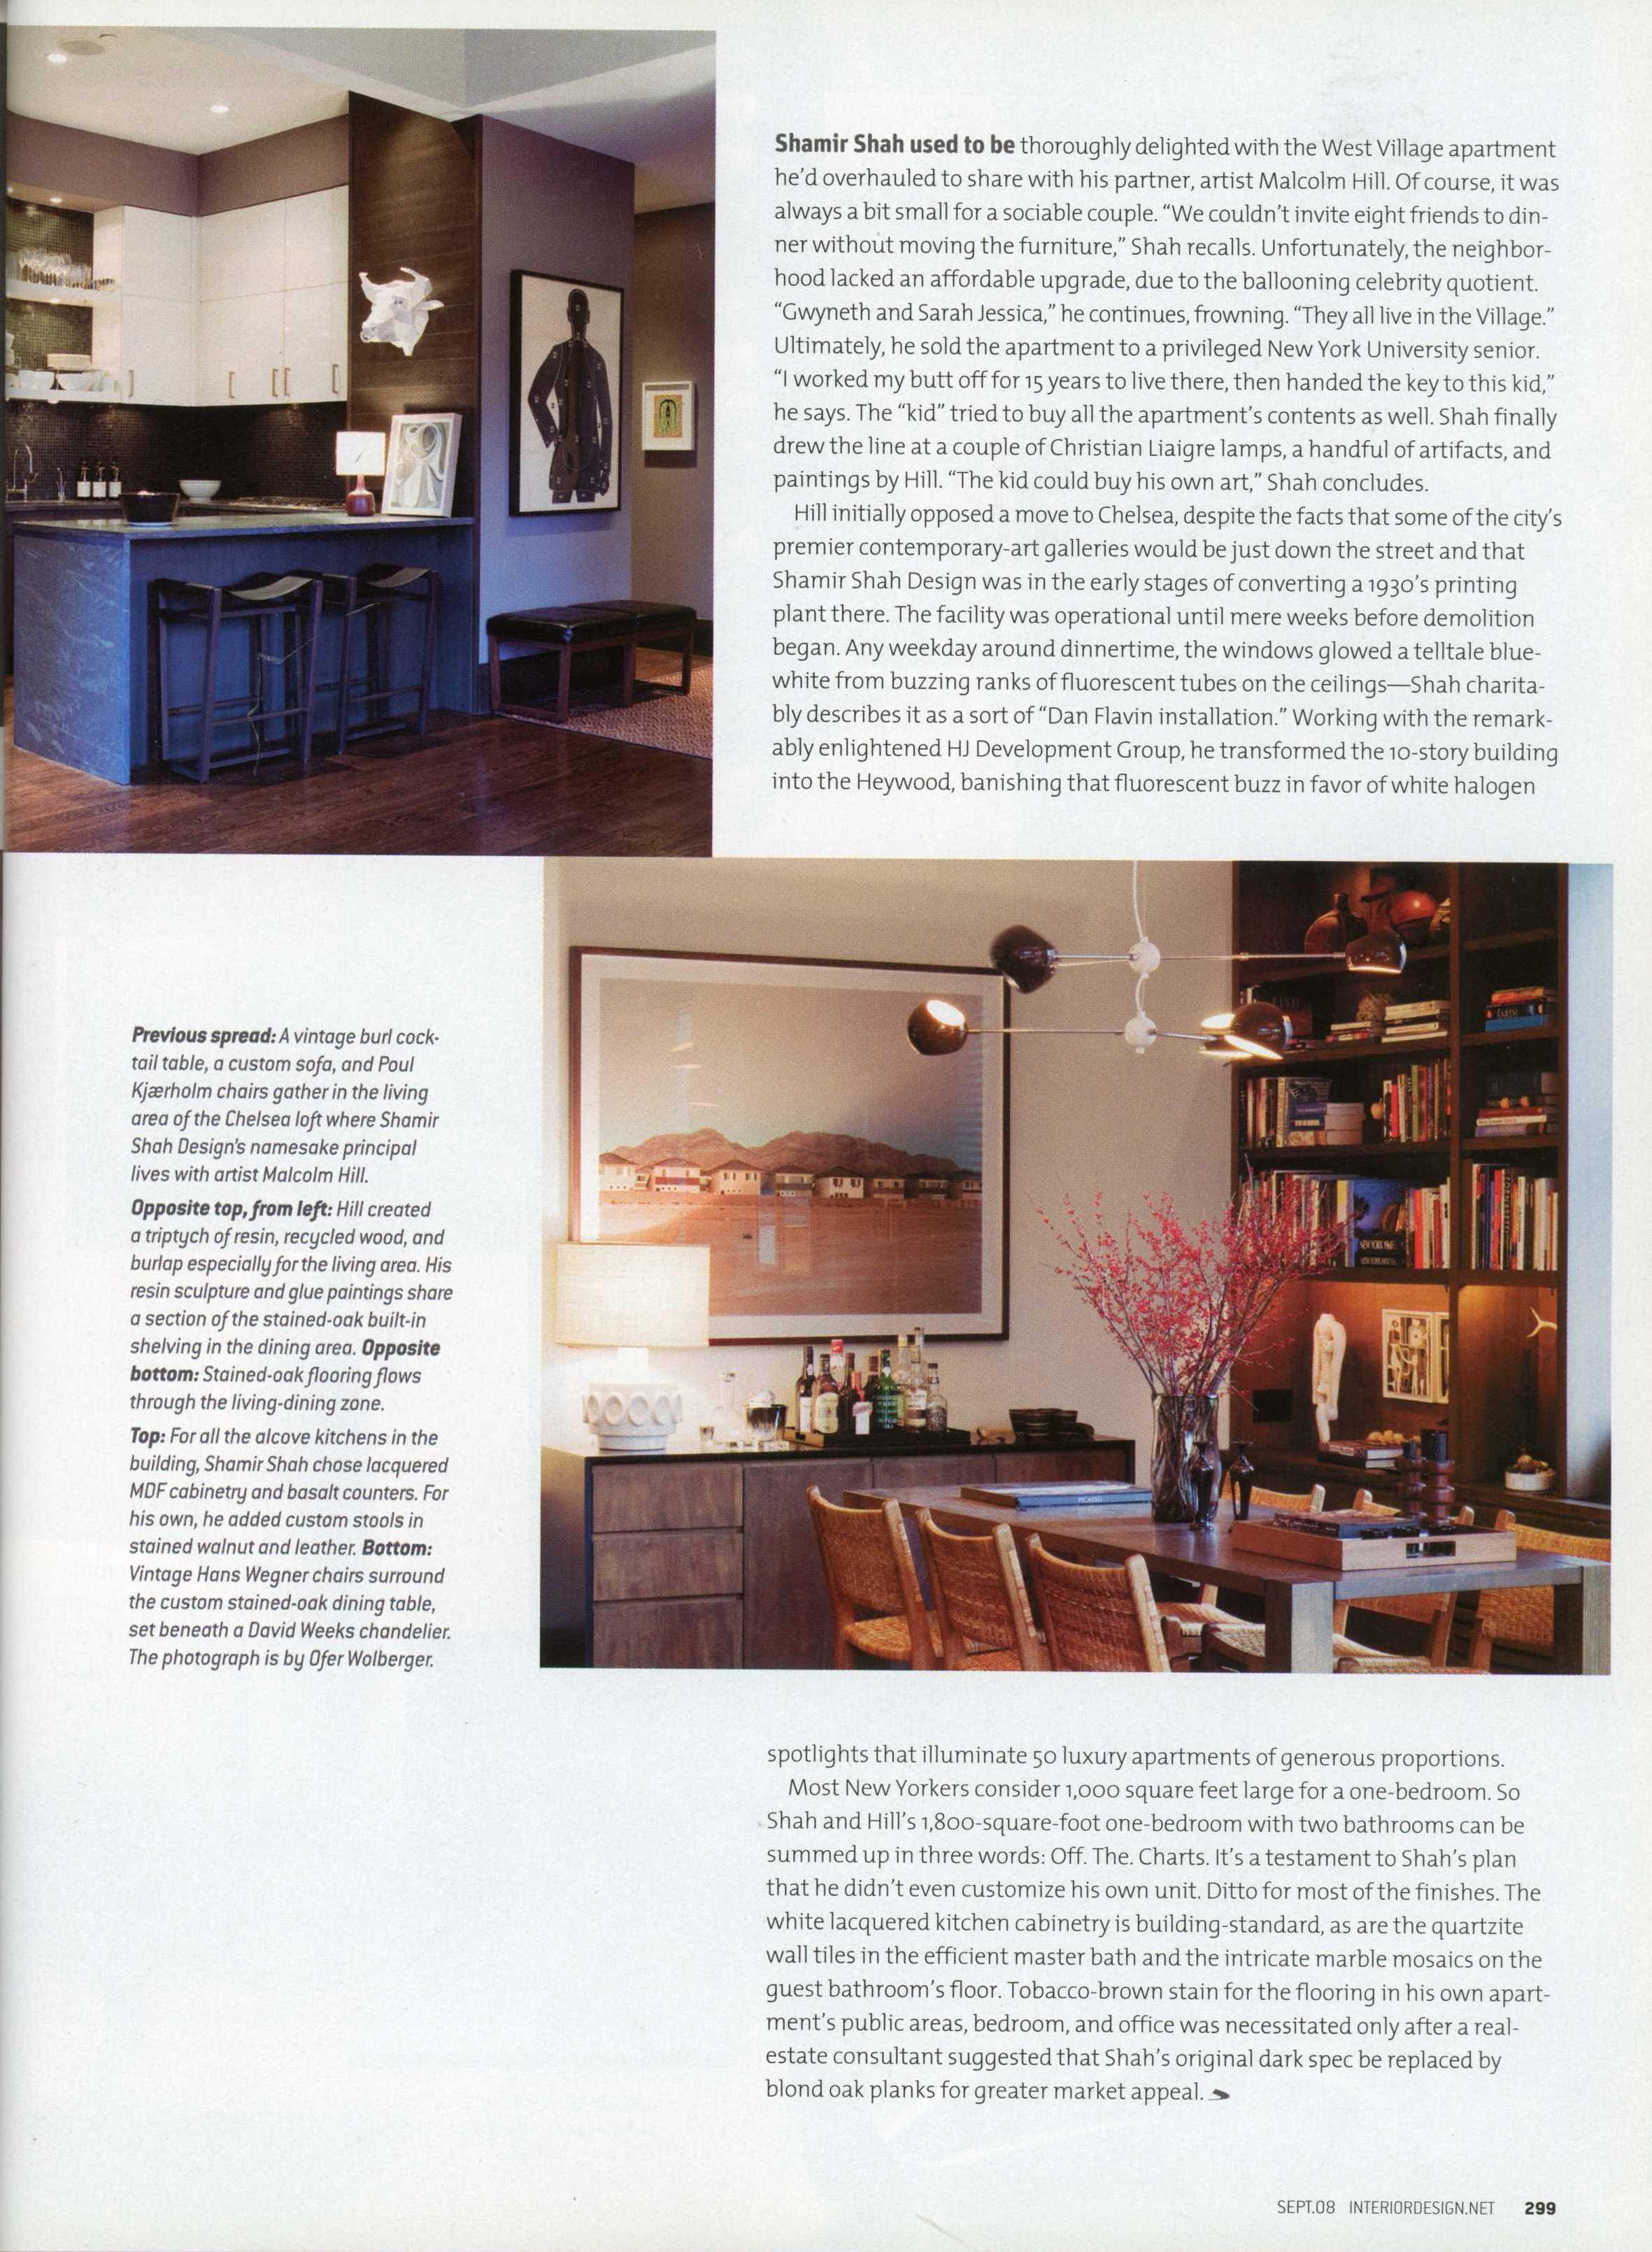 Interior Design_Sept 08_SS Apt_Full Article_Page_5.jpg